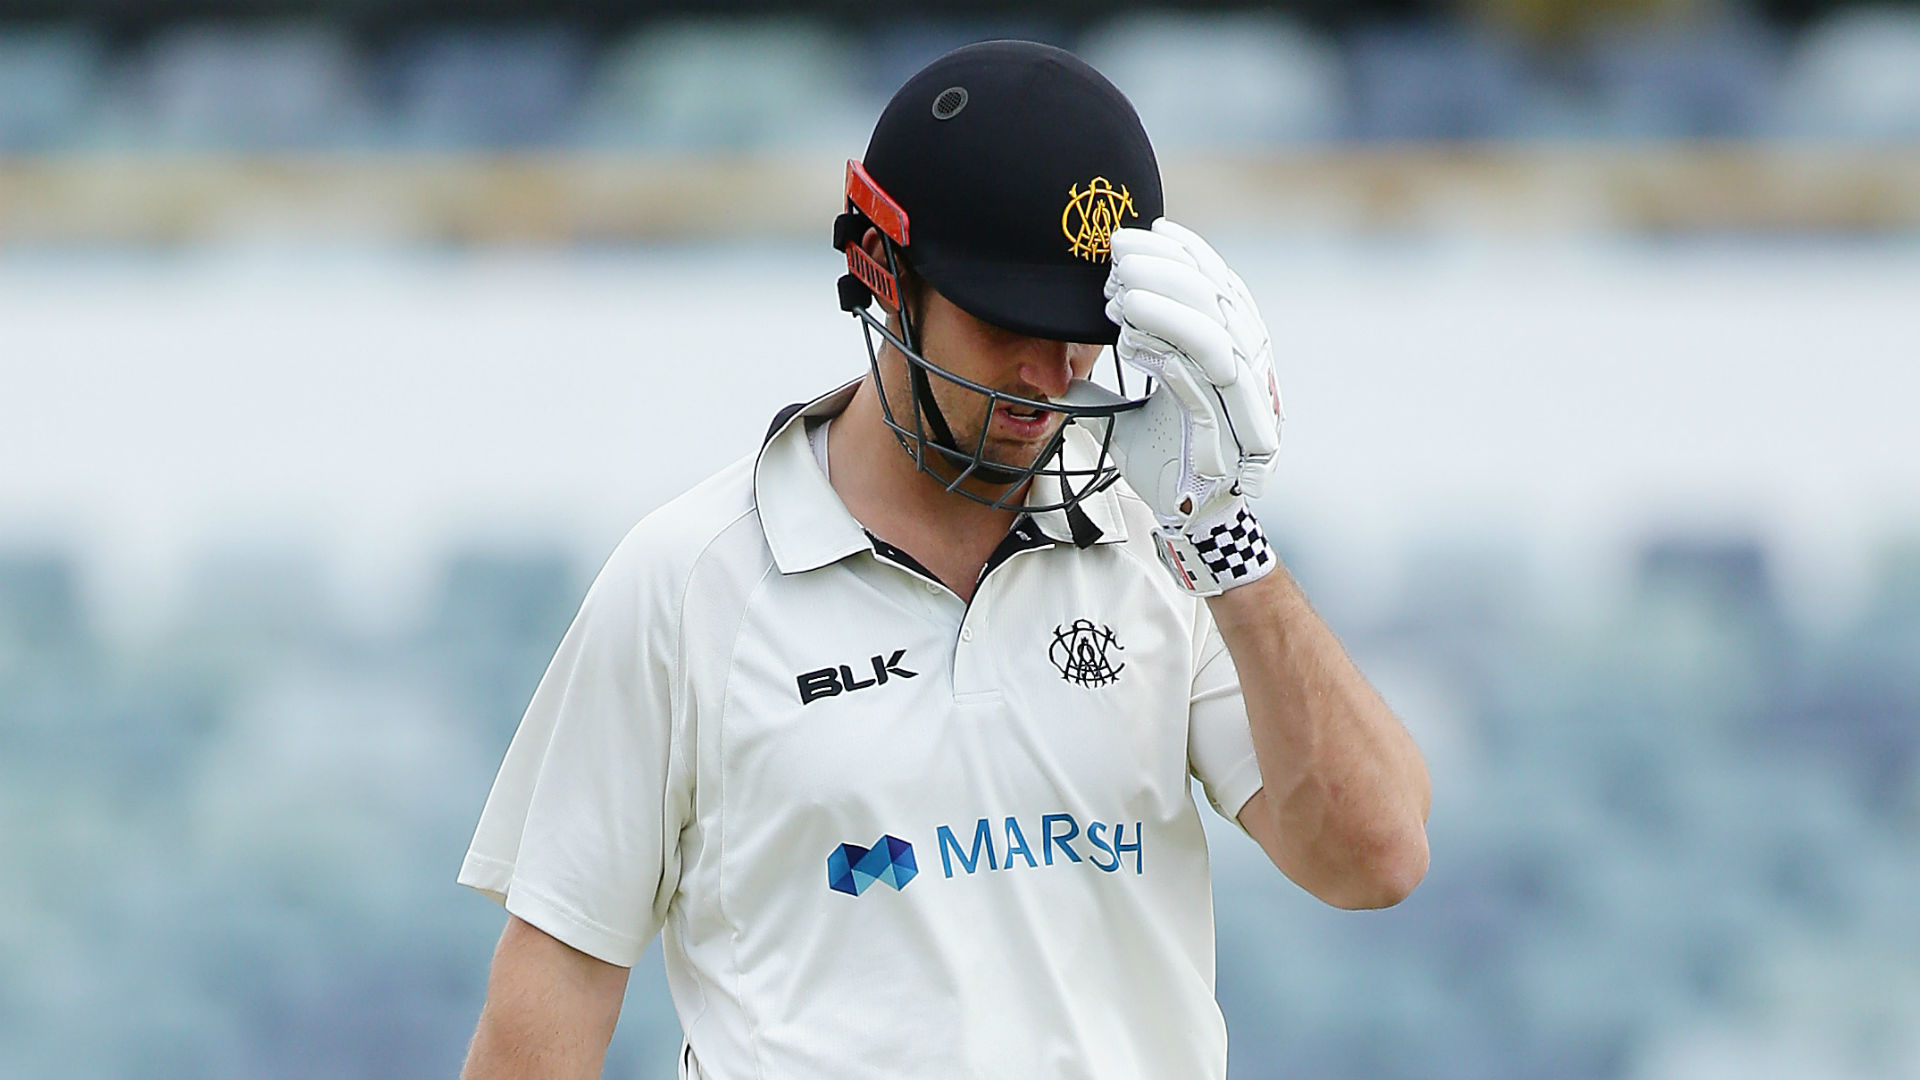 Australia all-rounder Marsh injures hand hitting dressing room wall